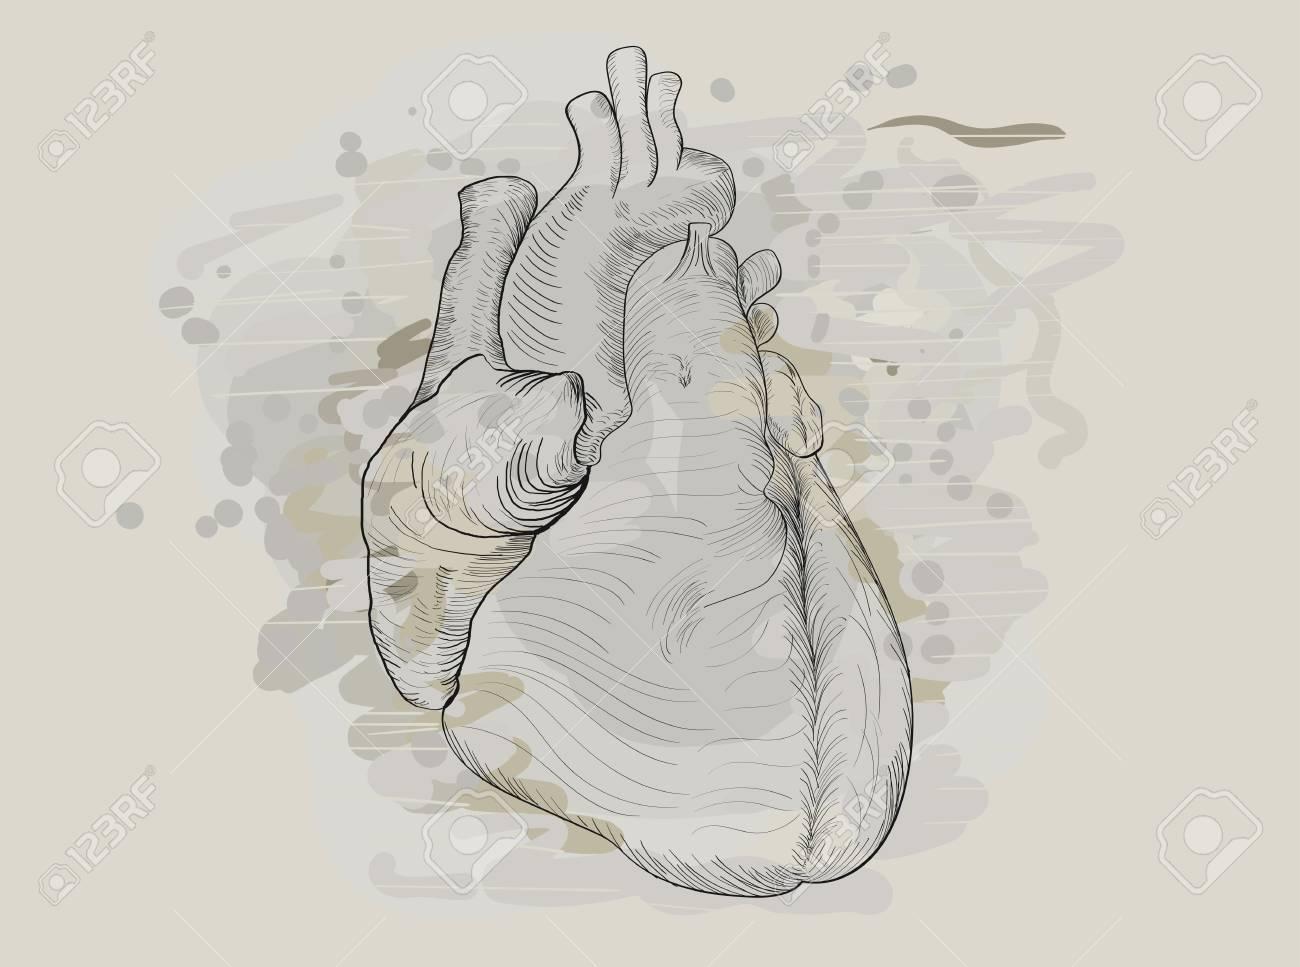 Computer graphic drawn human heart imitating pencil sketch